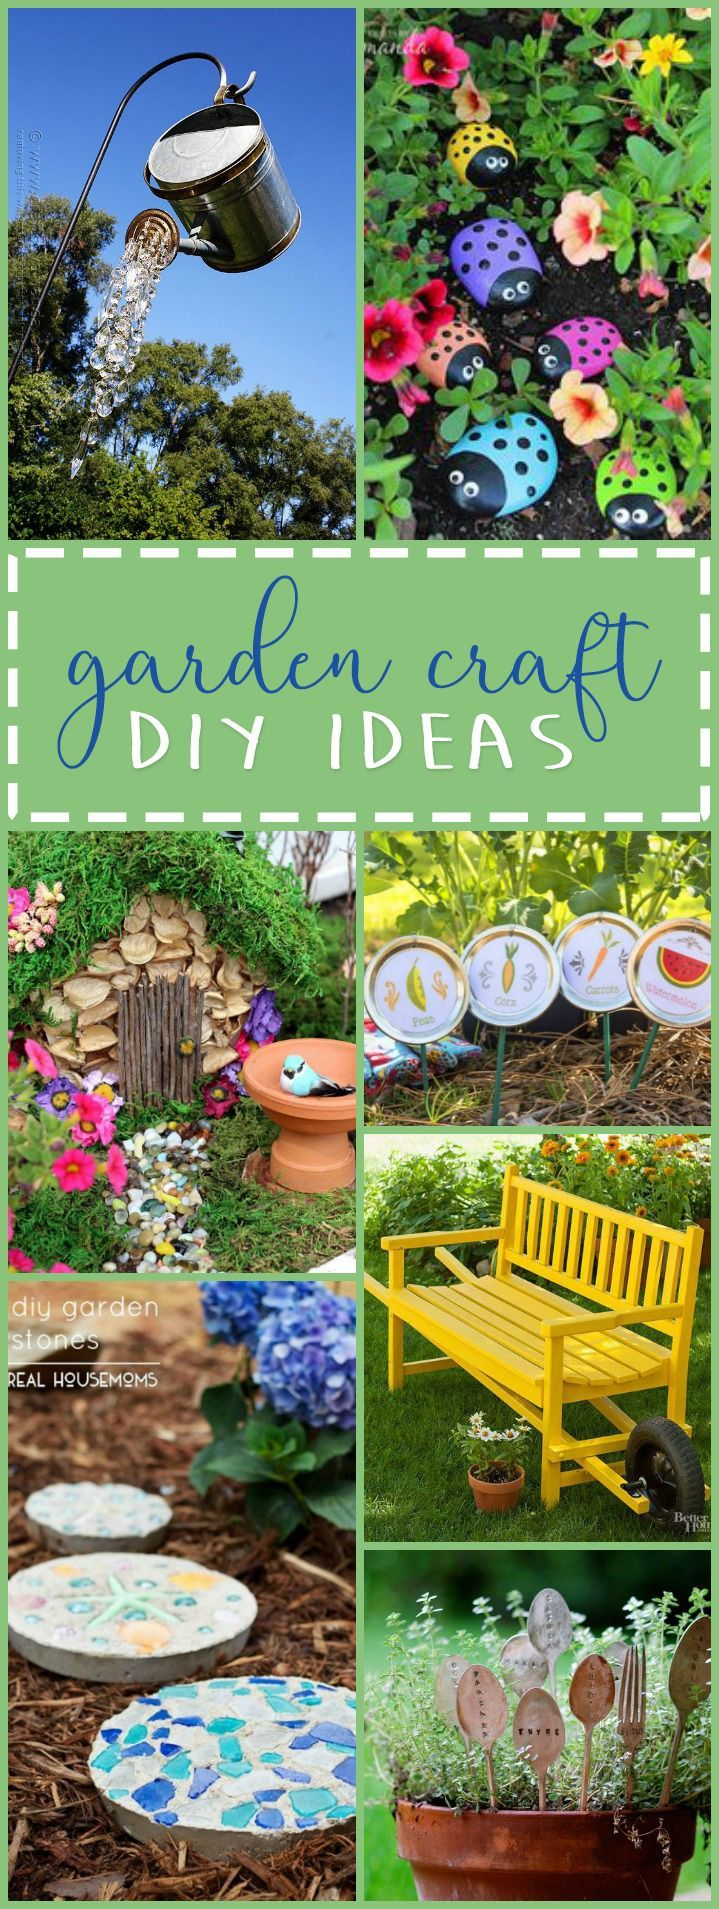 Diy garden decoration items - Diy Garden Crafts 24 Beautiful Garden Crafts For Every Age